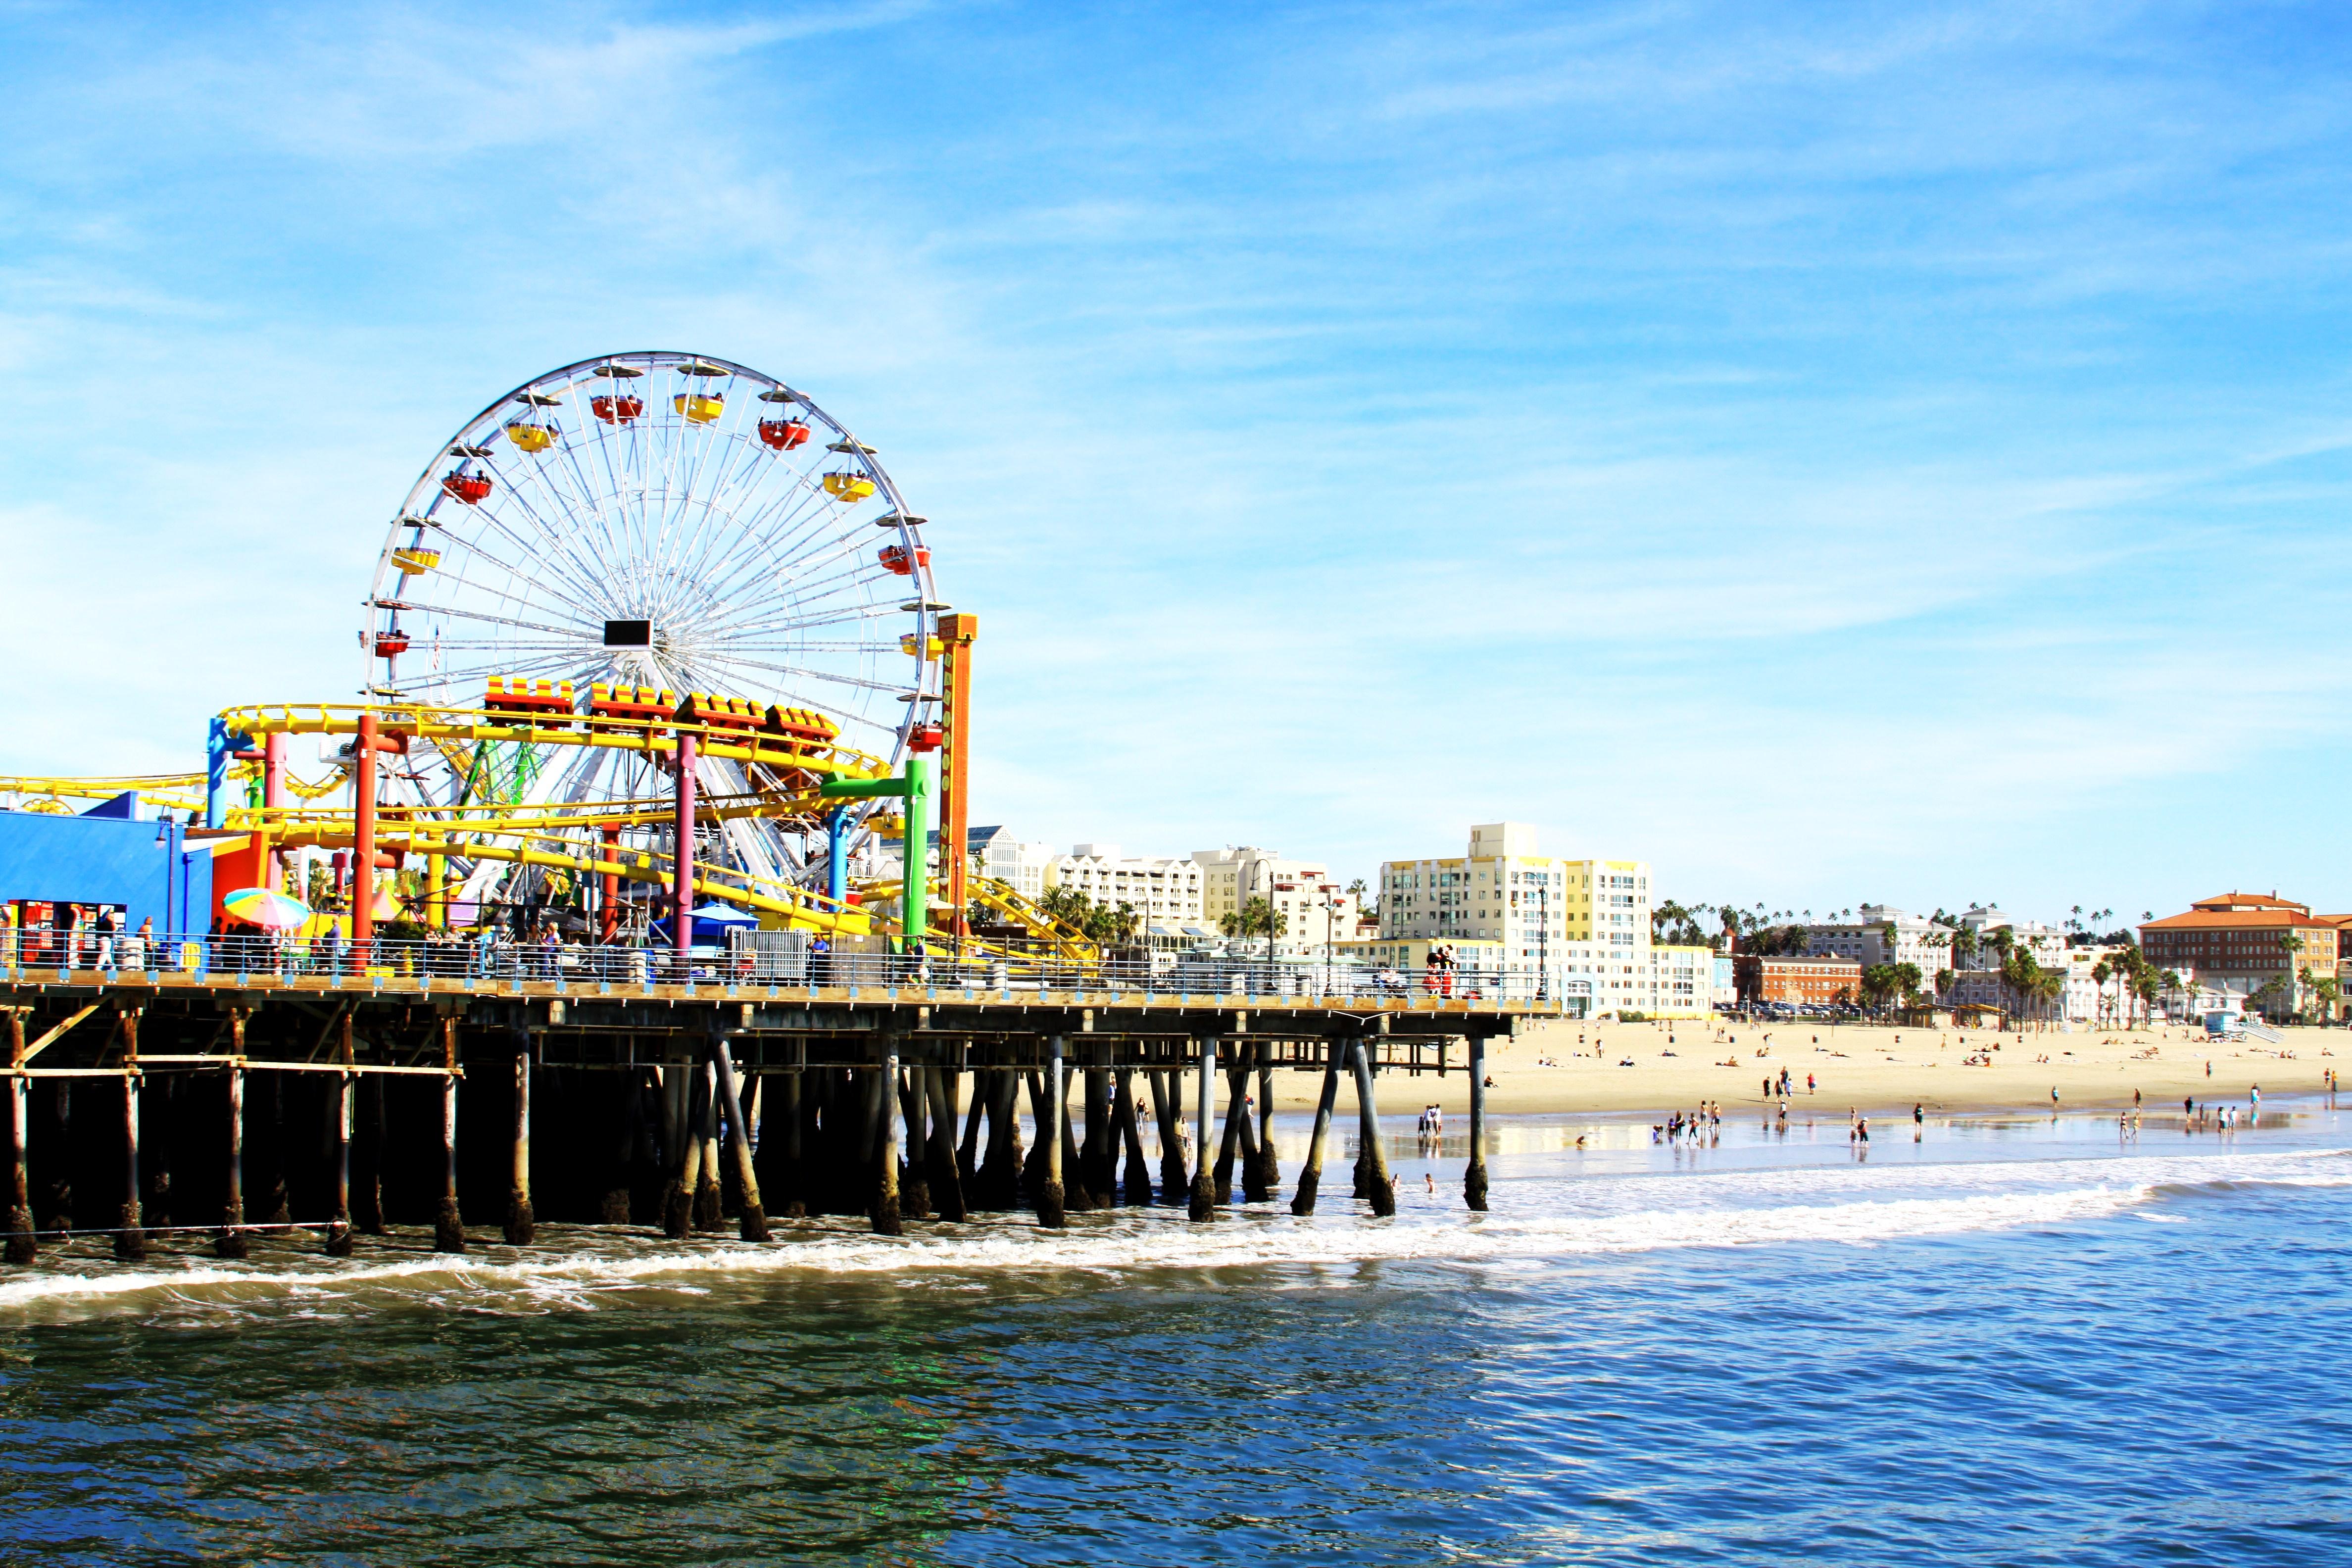 Best Ocean Beach Spots In Washington To Park